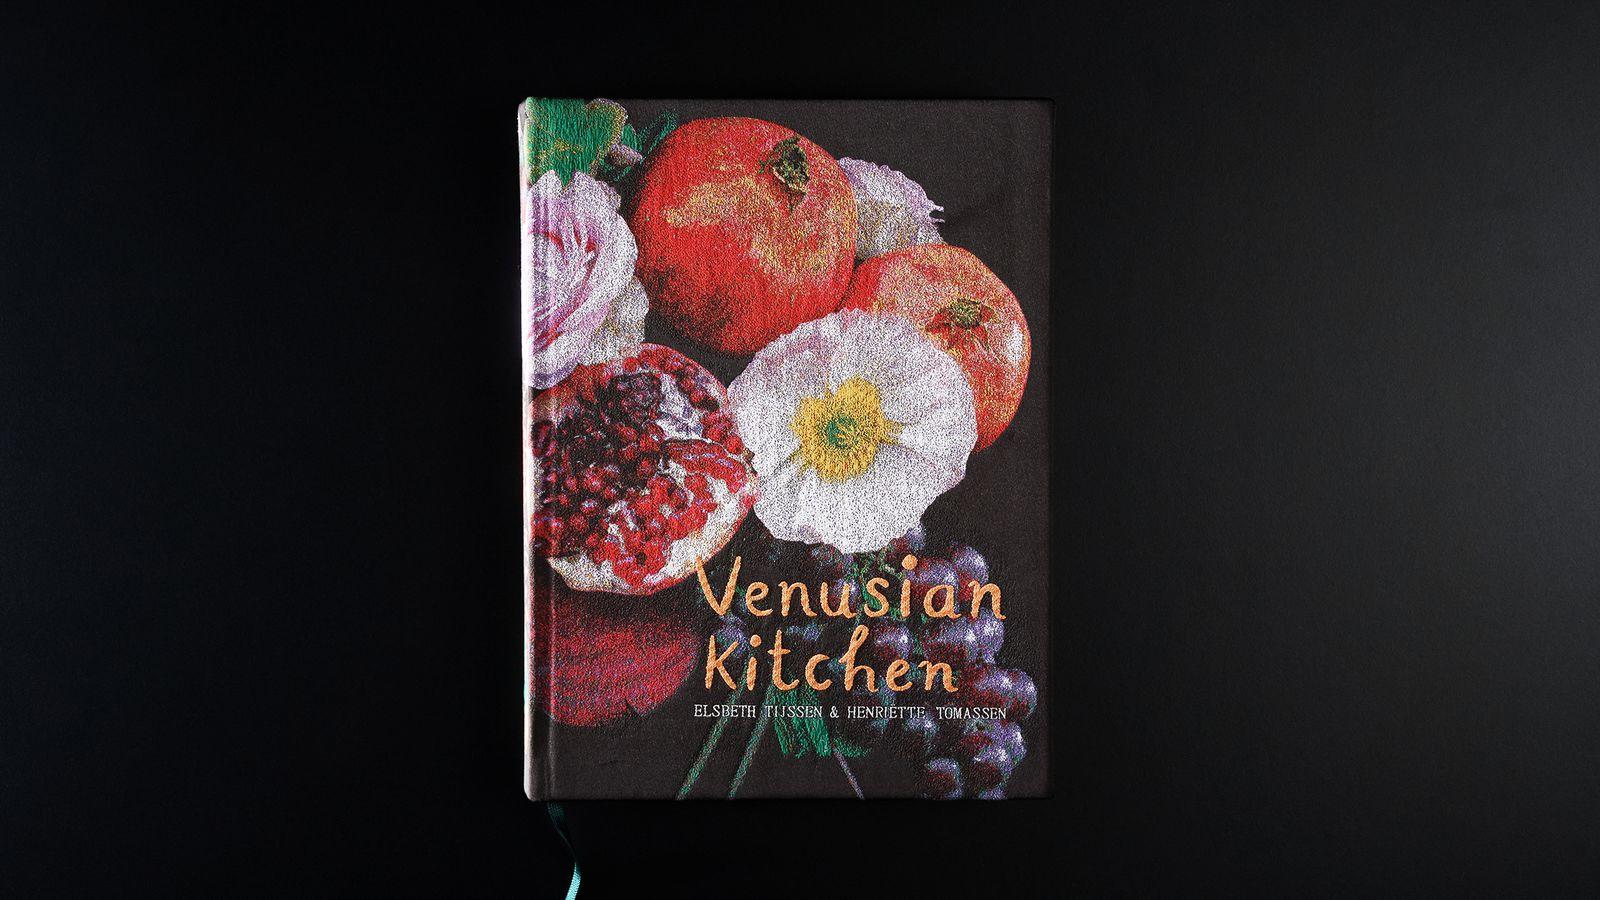 Venusian kitchen - cover 2.jpg